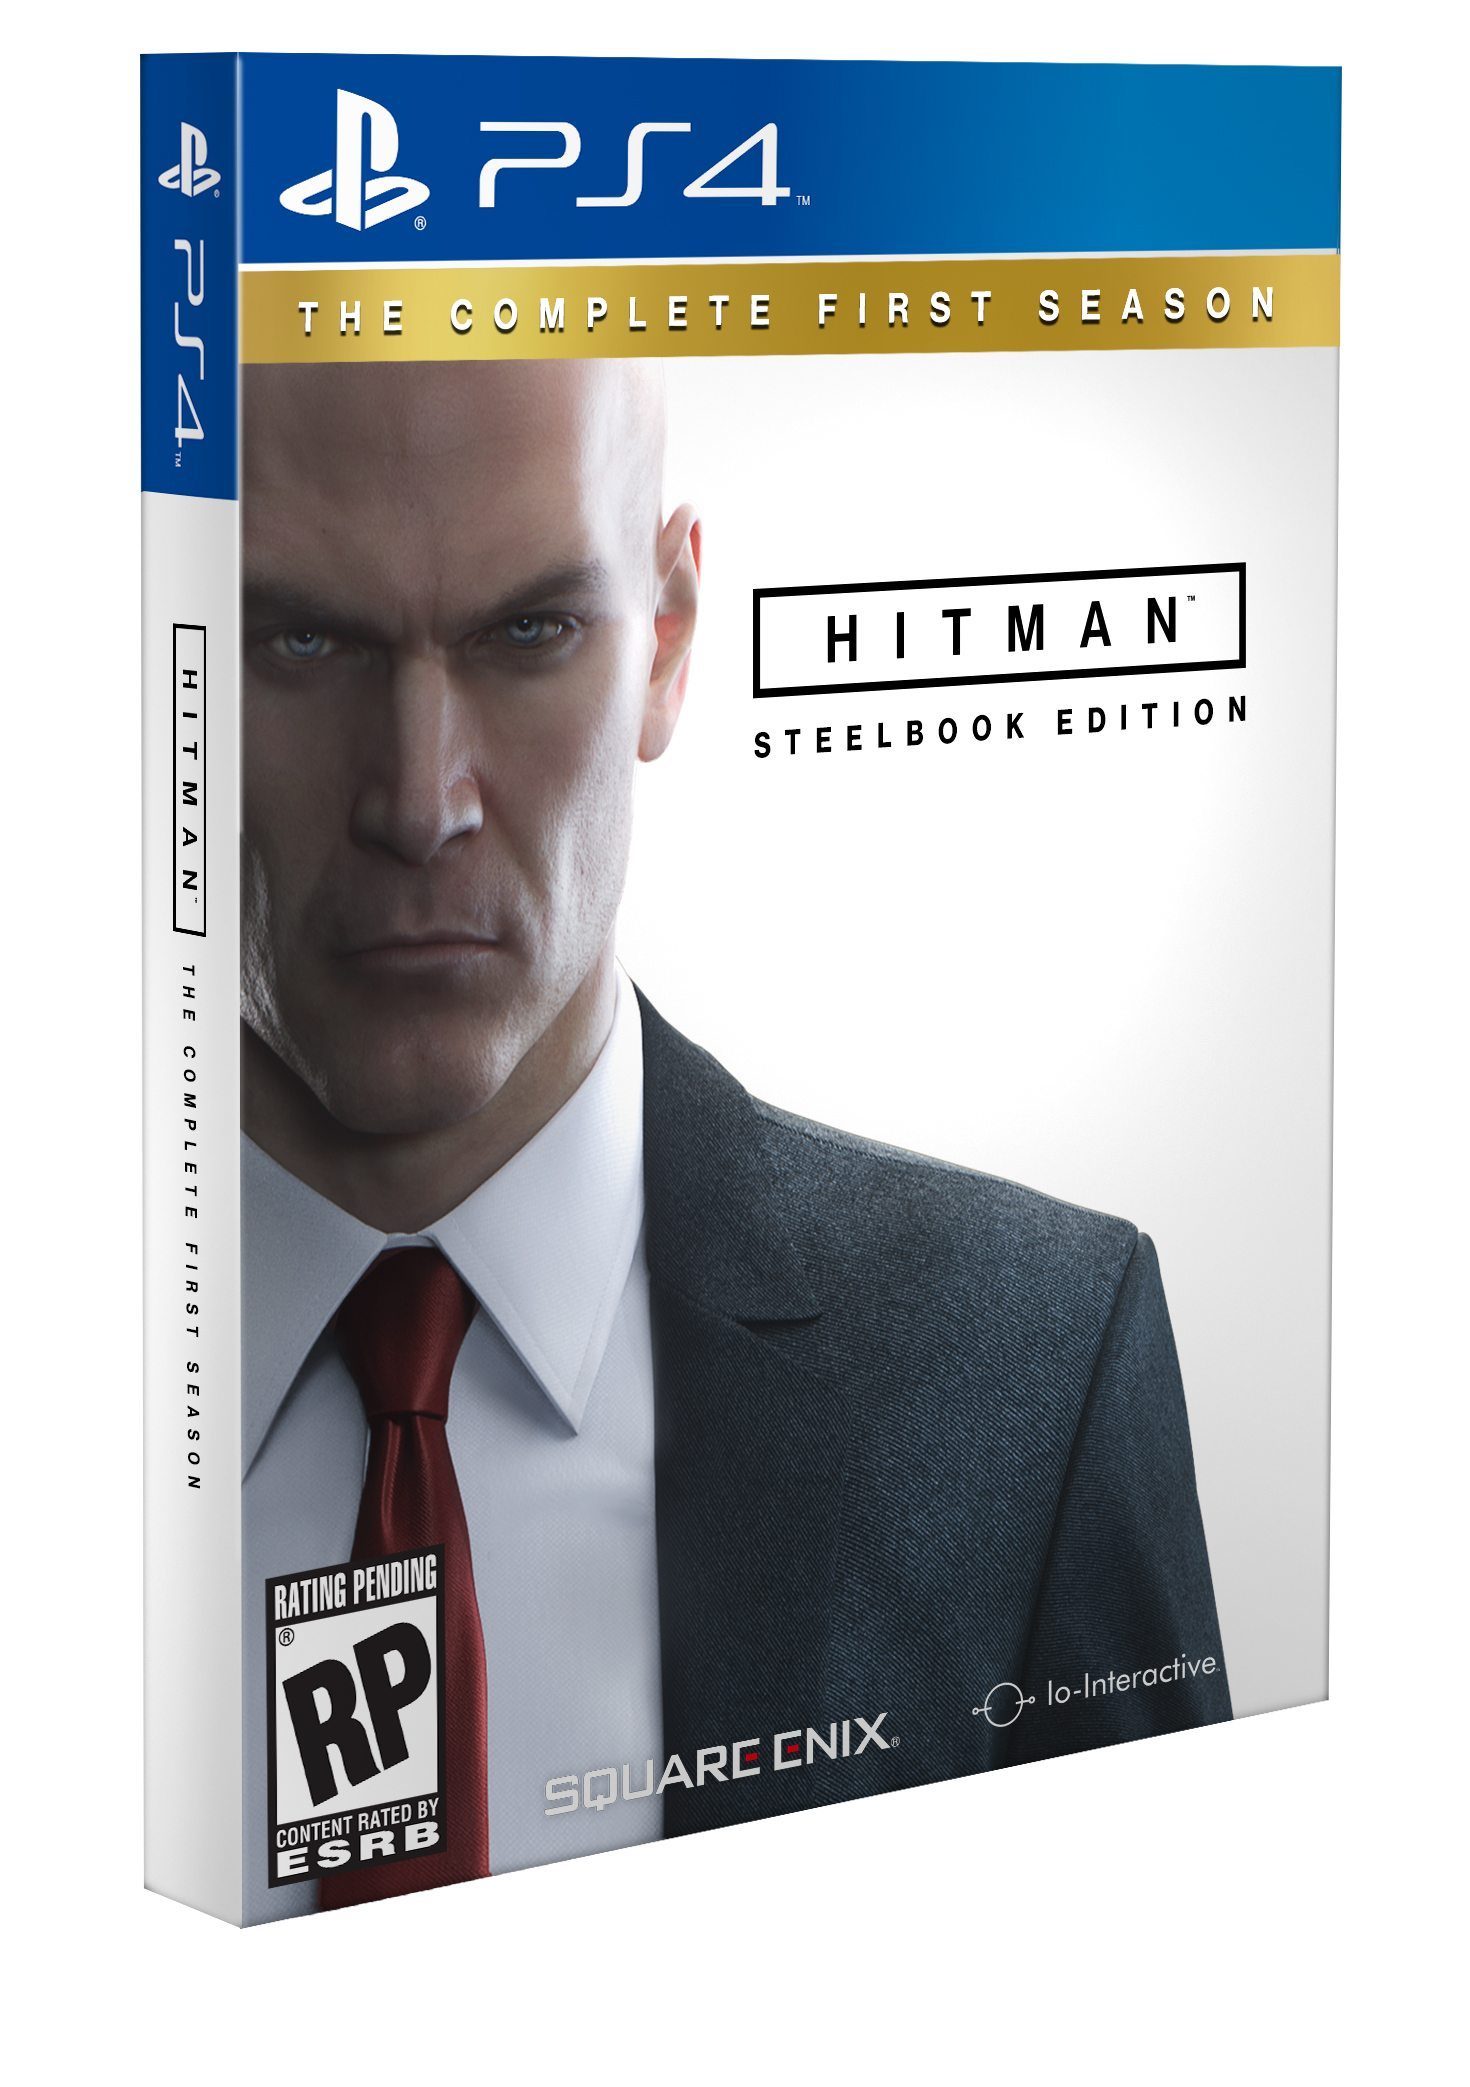 Hitman ps4 release date in Australia